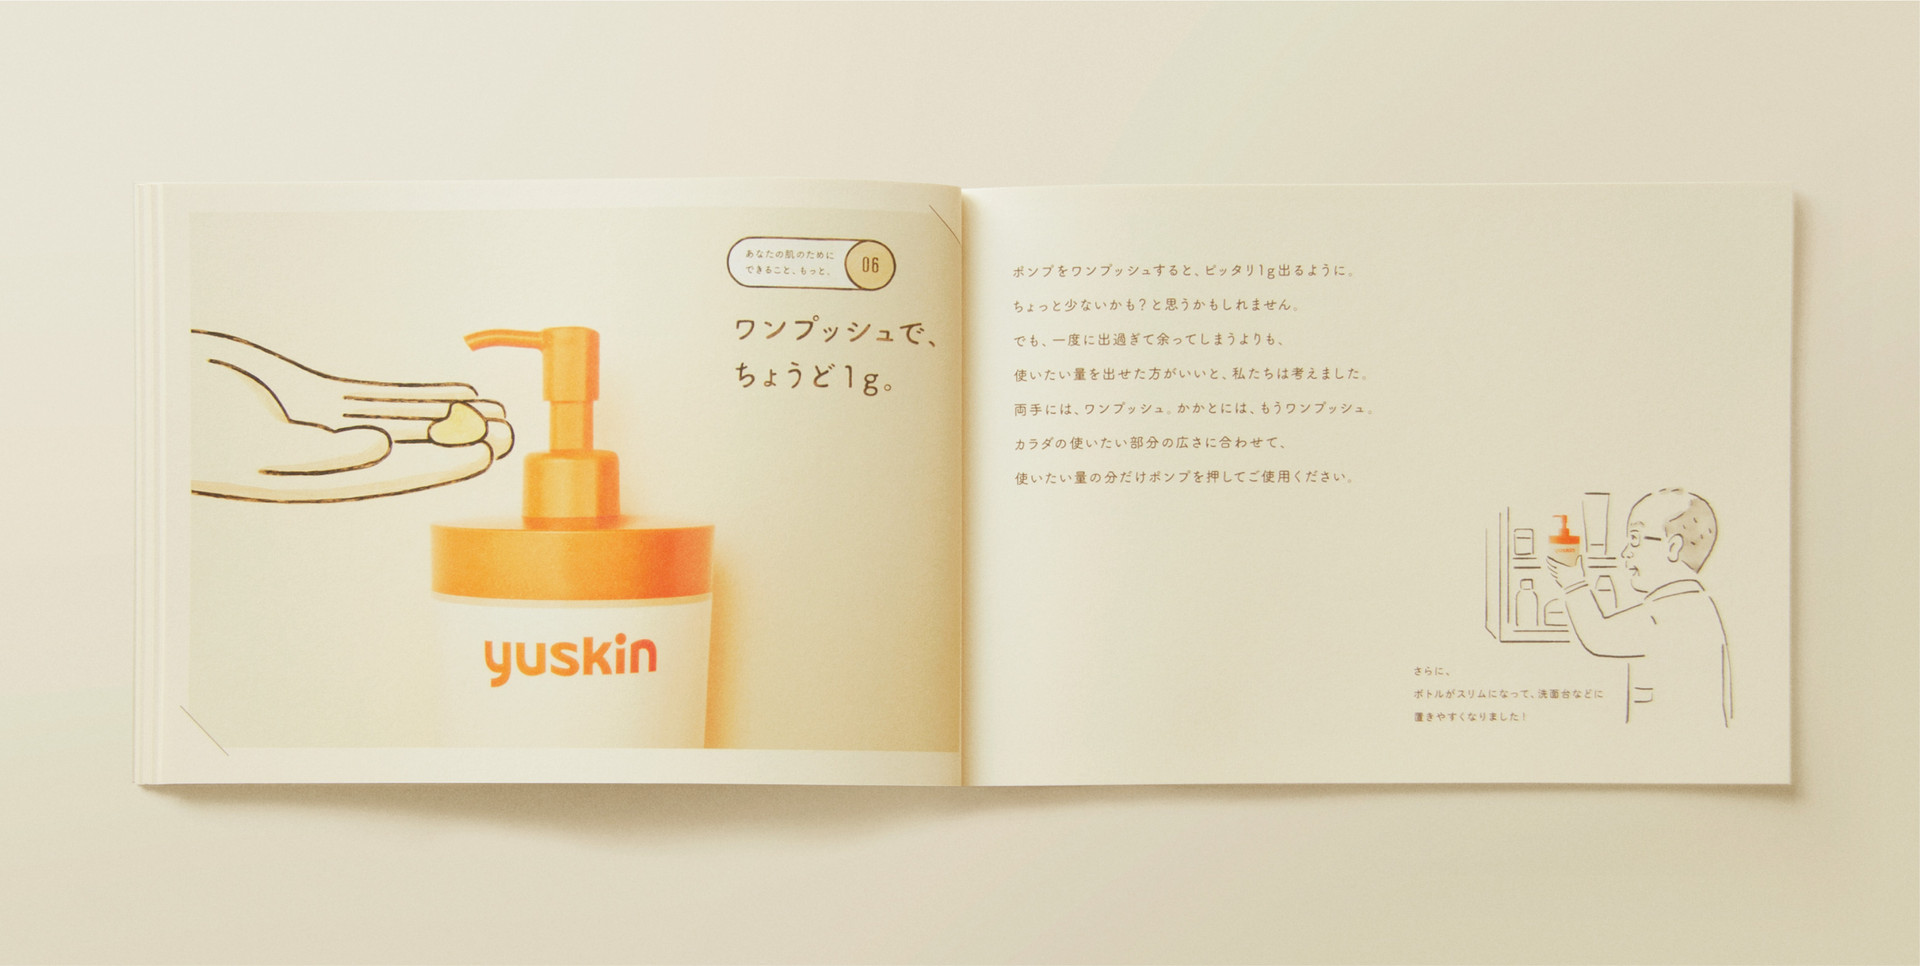 yuskin_14.jpg